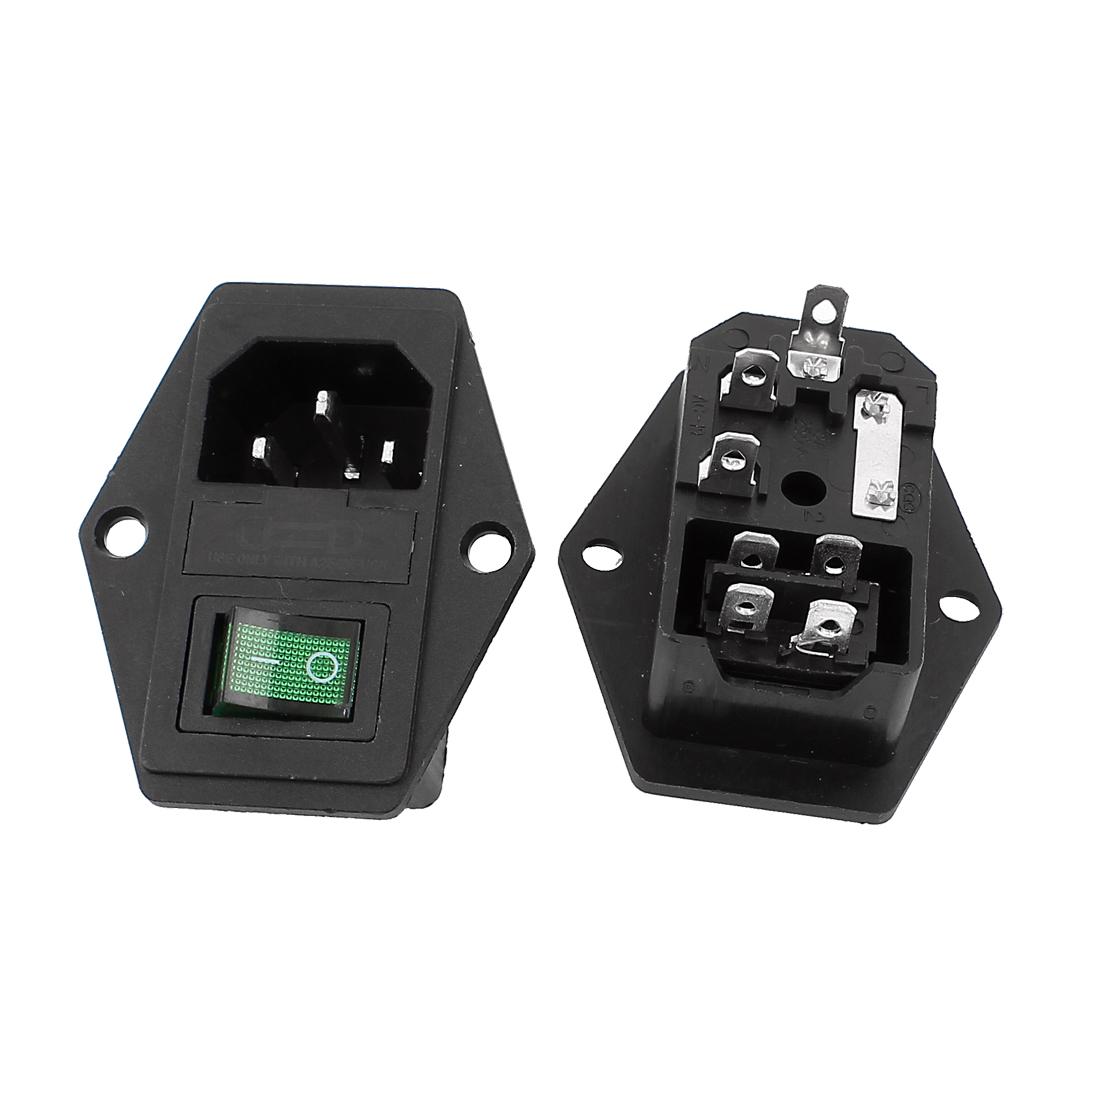 2pcs IEC320 C14 Power Inlet Green Light Rocker Switch AC 250V 15A w Fuse Holder